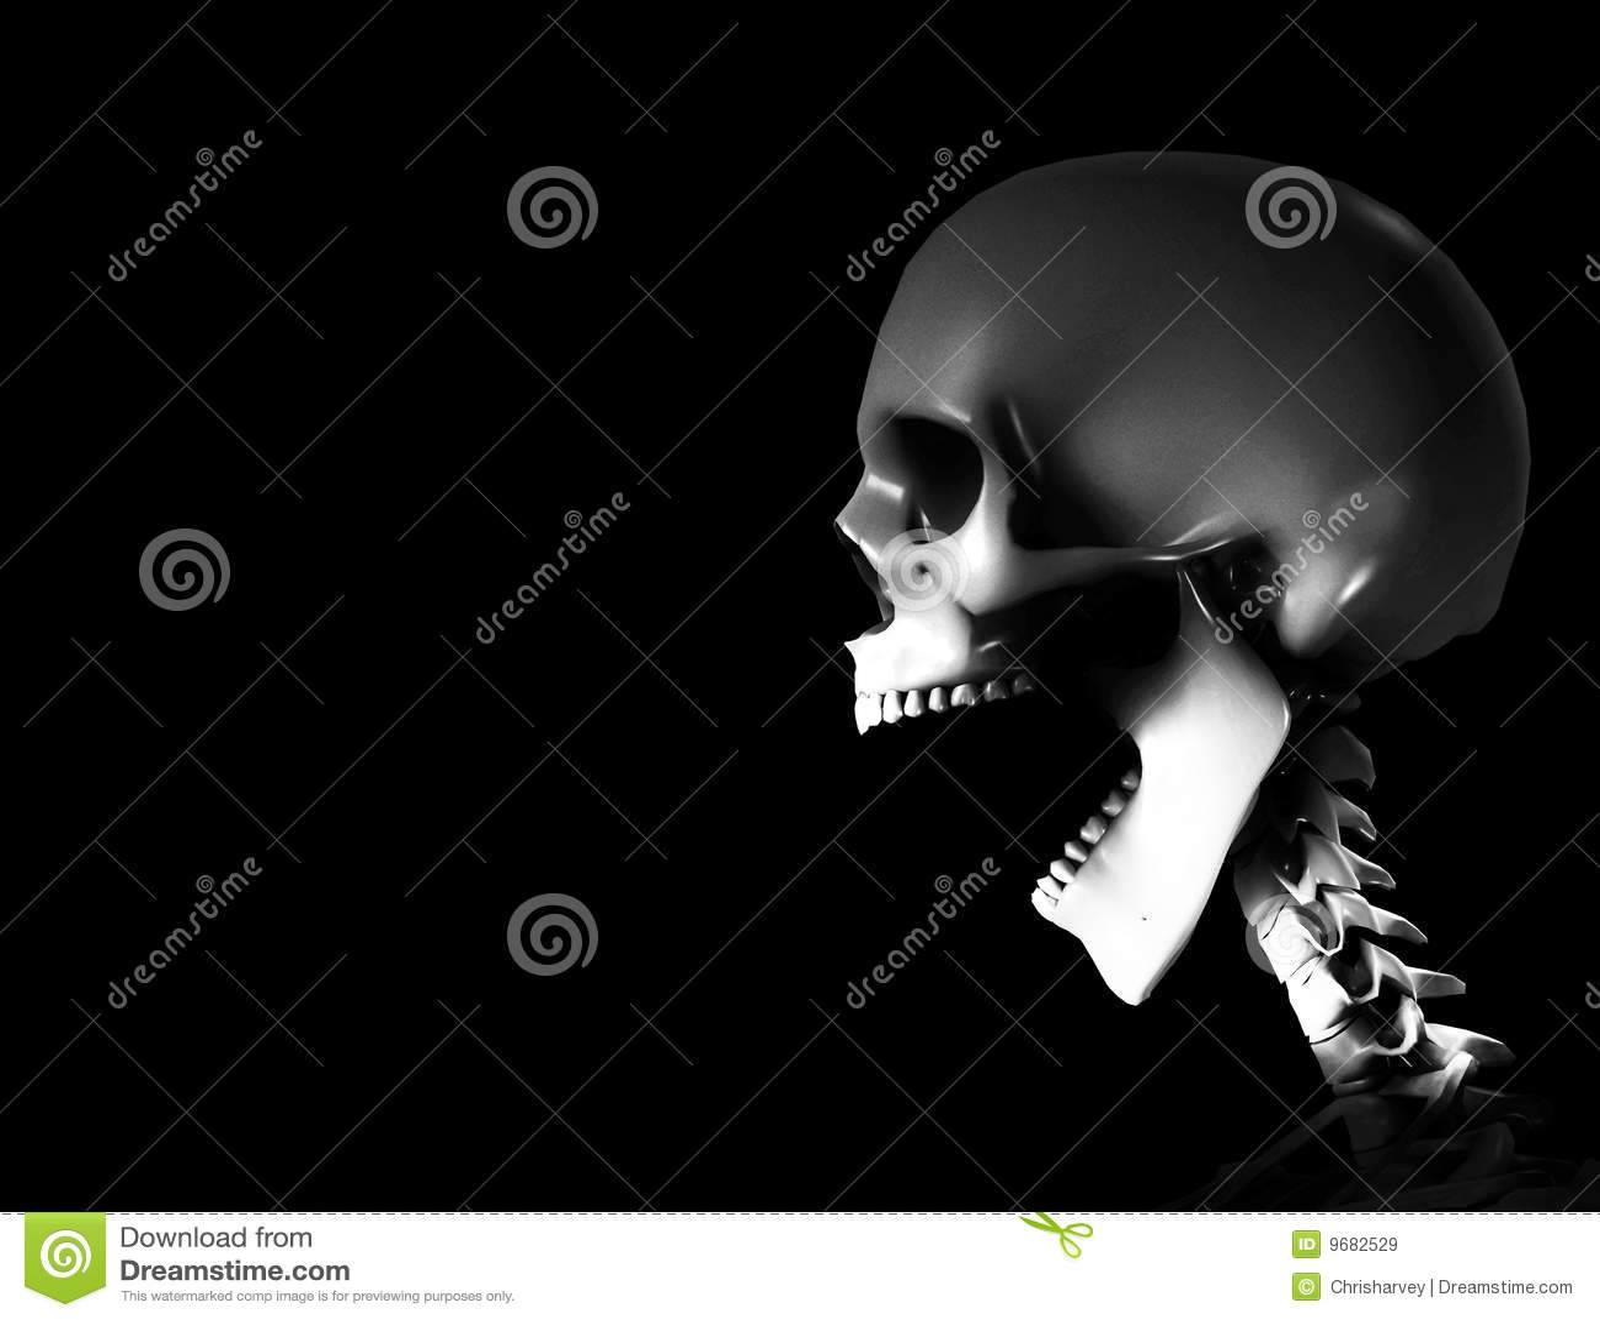 Esqueleto de grito